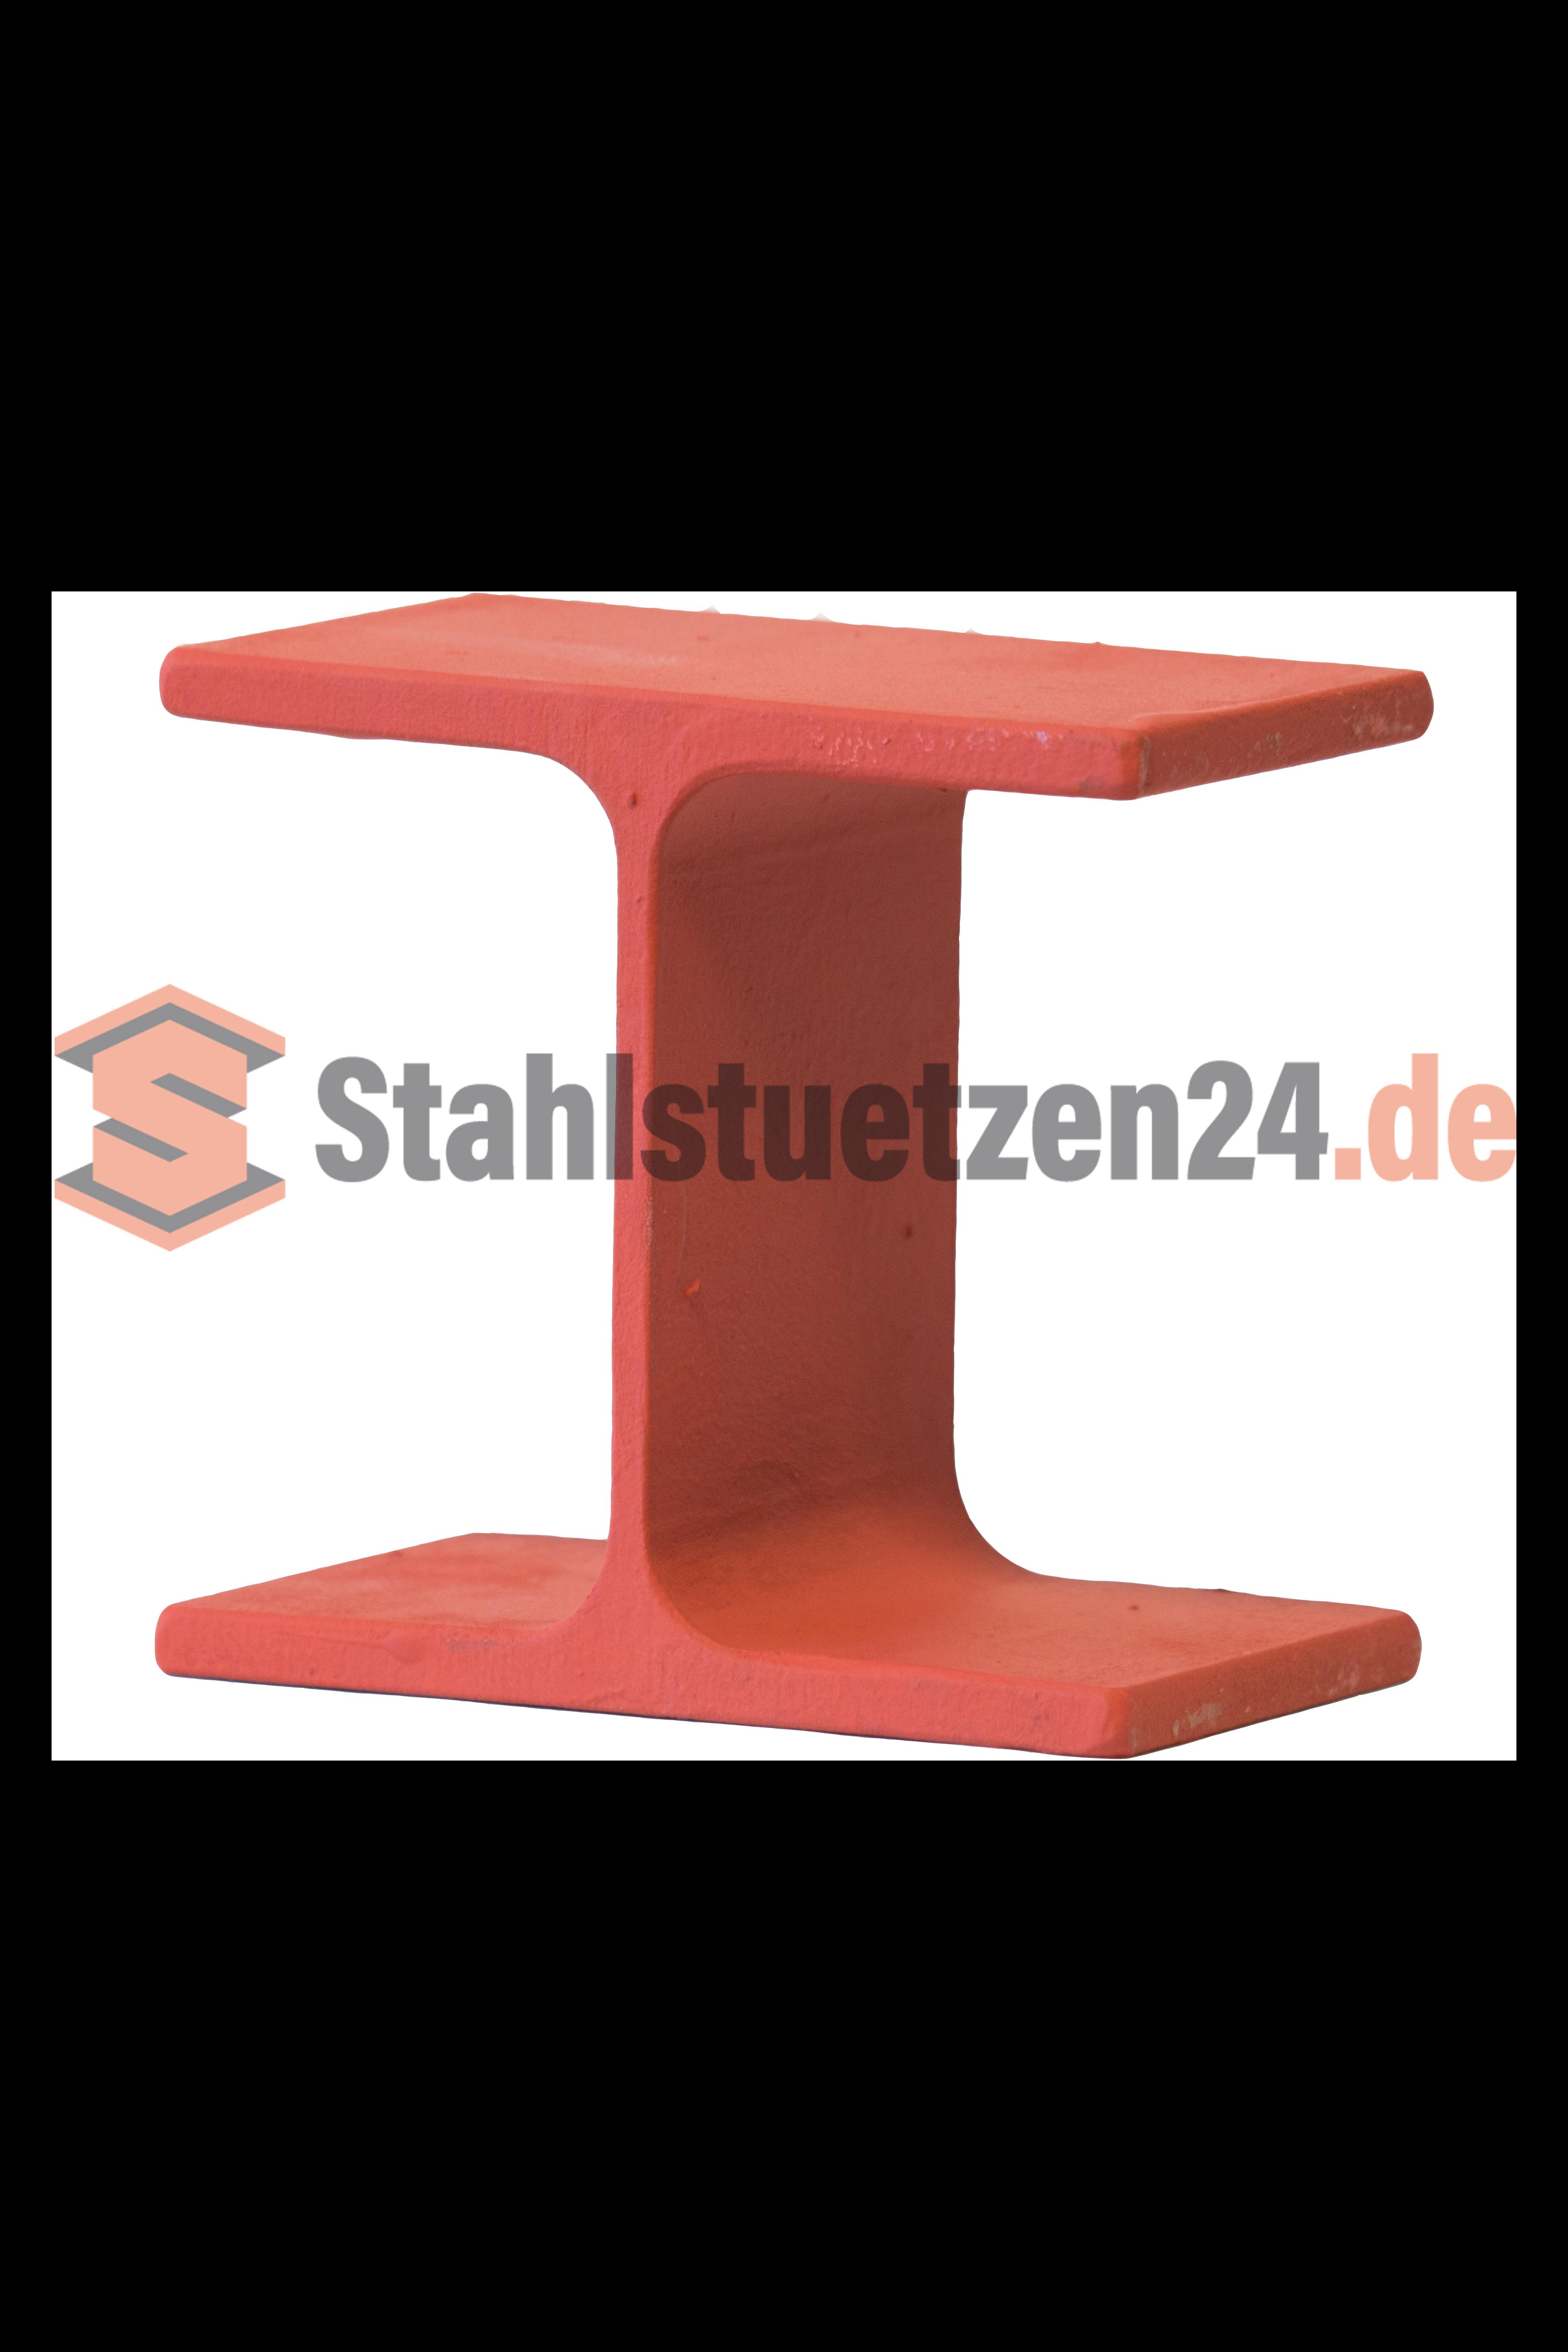 Stahlträger Grundieren hea stahlträger stahlstuetzen24 de